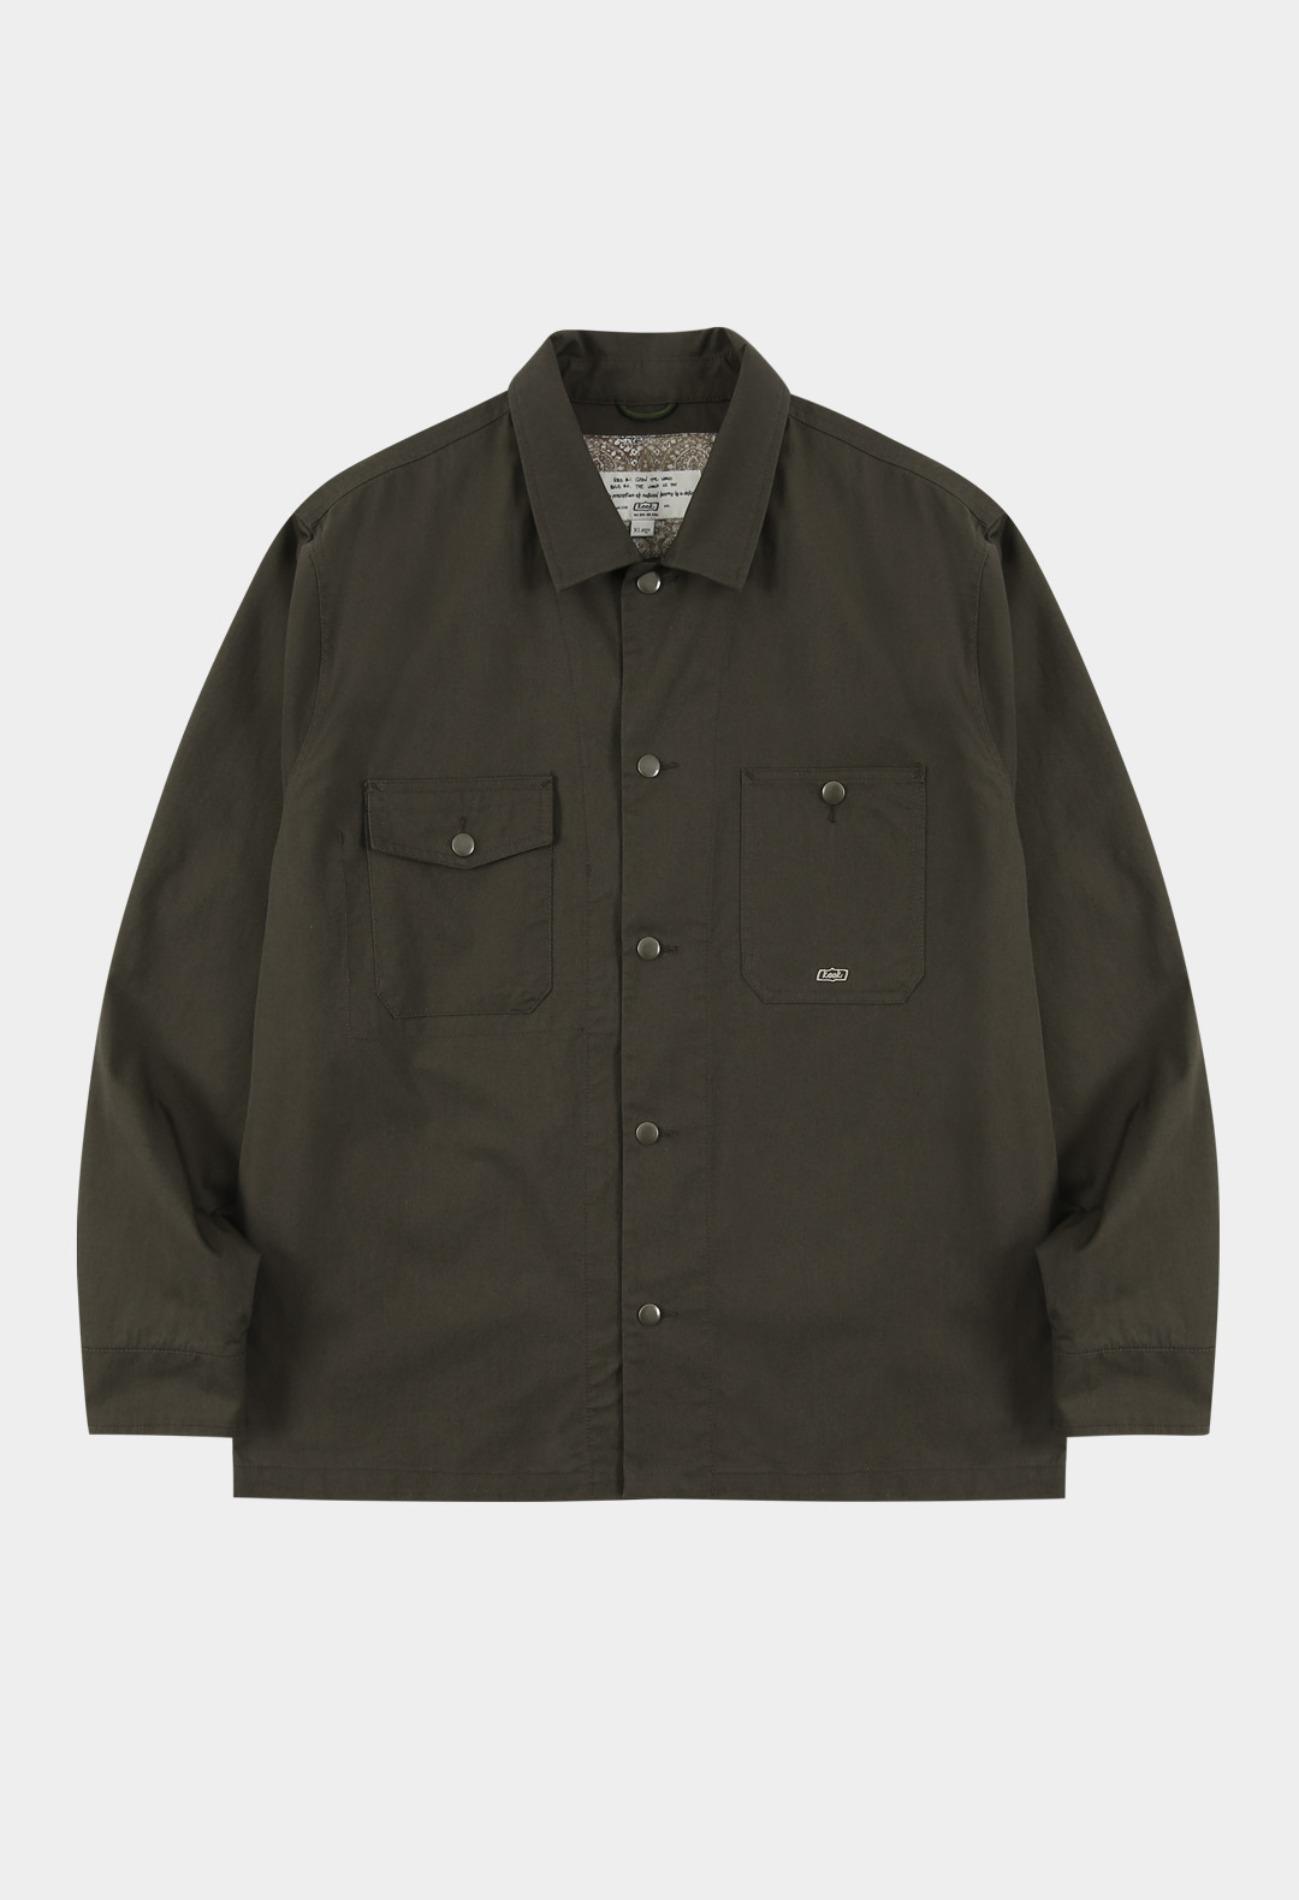 keek Snap Shirt Jacket - Khaki 스트릿패션 유니섹스브랜드 커플시밀러룩 남자쇼핑몰 여성의류쇼핑몰 후드티 힙색